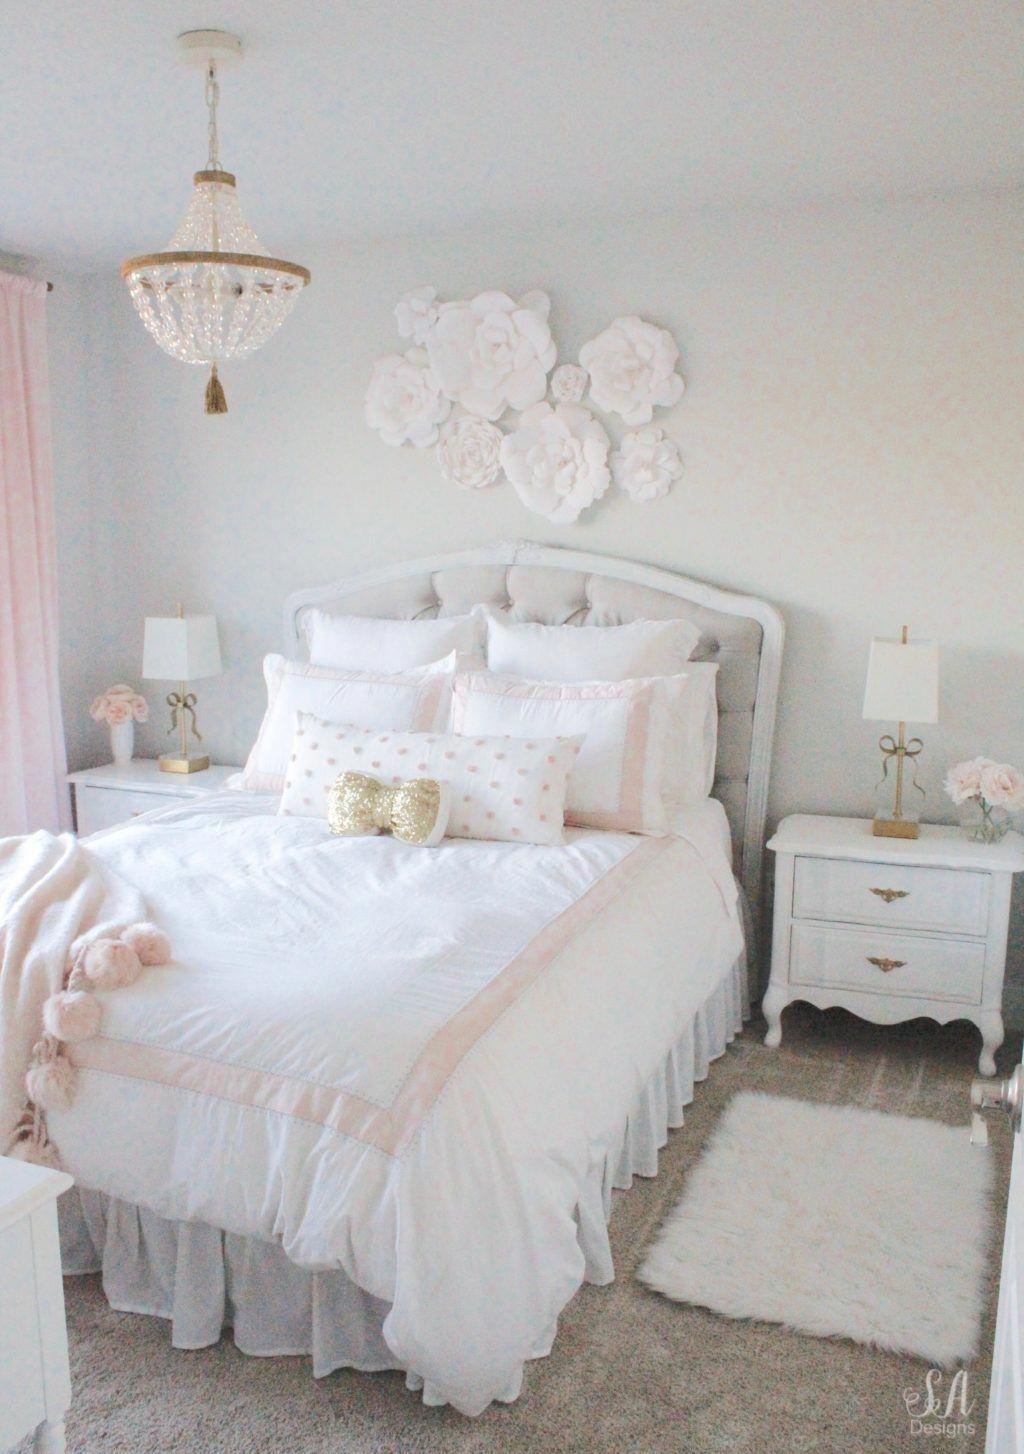 Blush Bedroom Blush And Gold Blush Gold Grey Modern Vintage Style Modern Vintage Bedroom Modern Modern Vintage Bedrooms Bedroom Vintage Tween Girl Bedroom